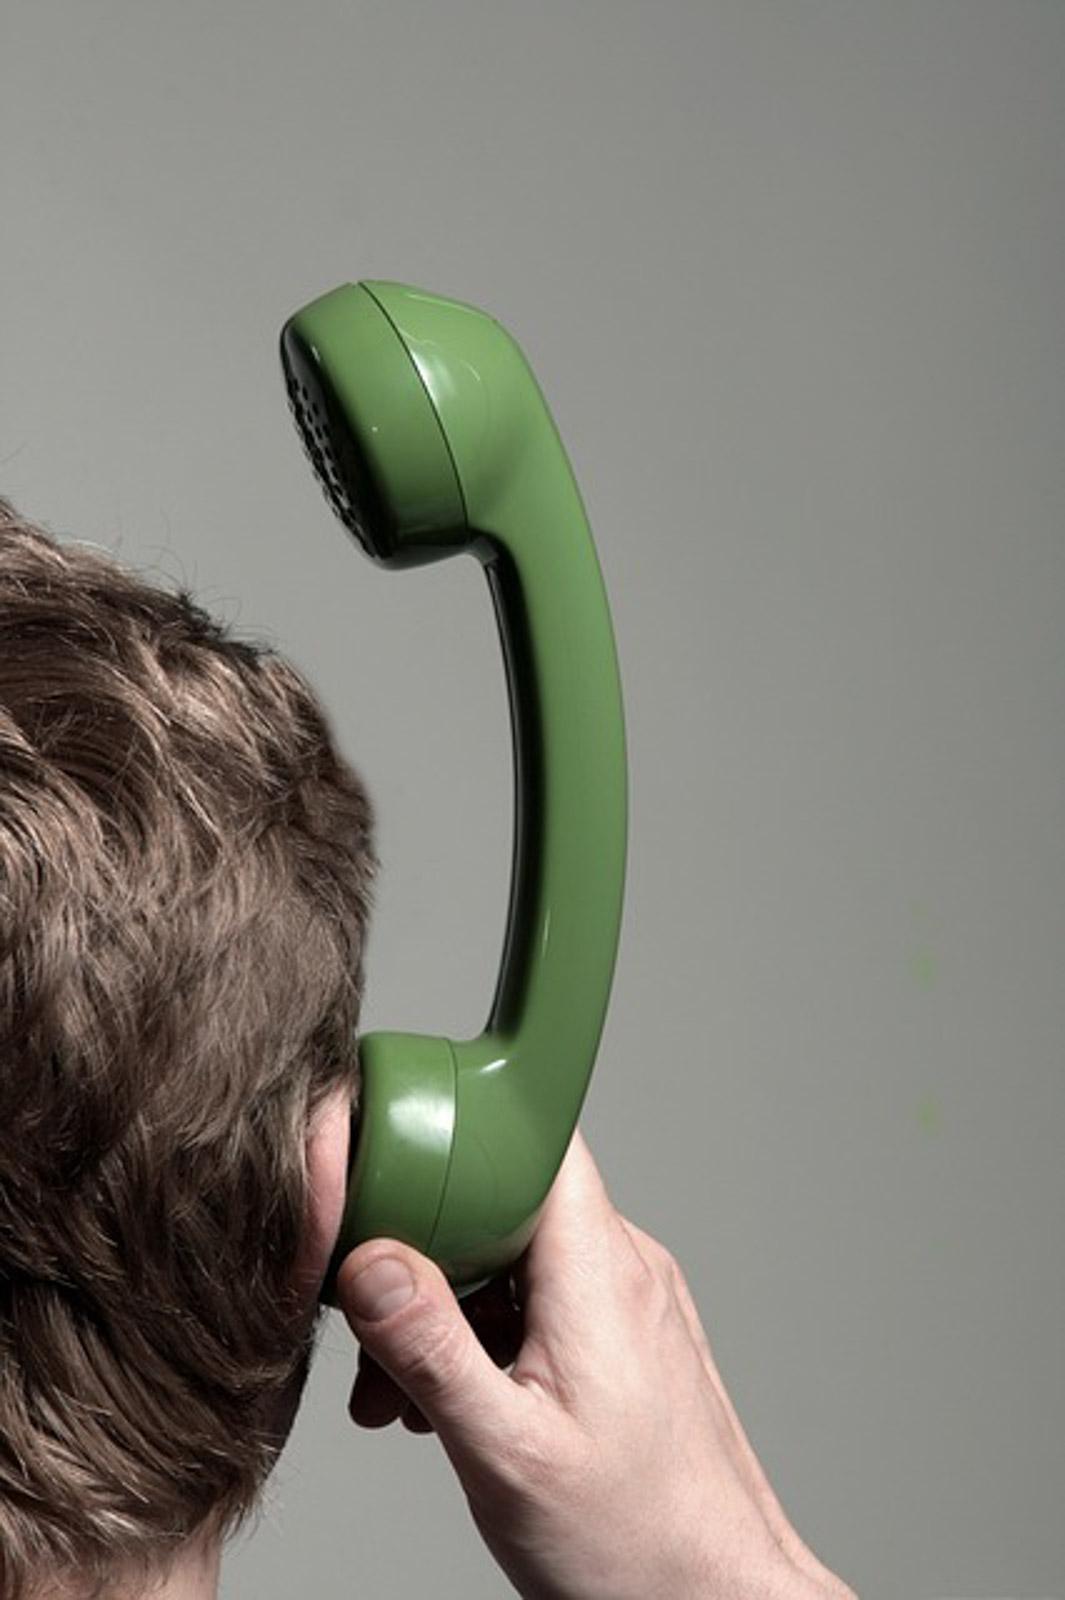 communication 2138980 640